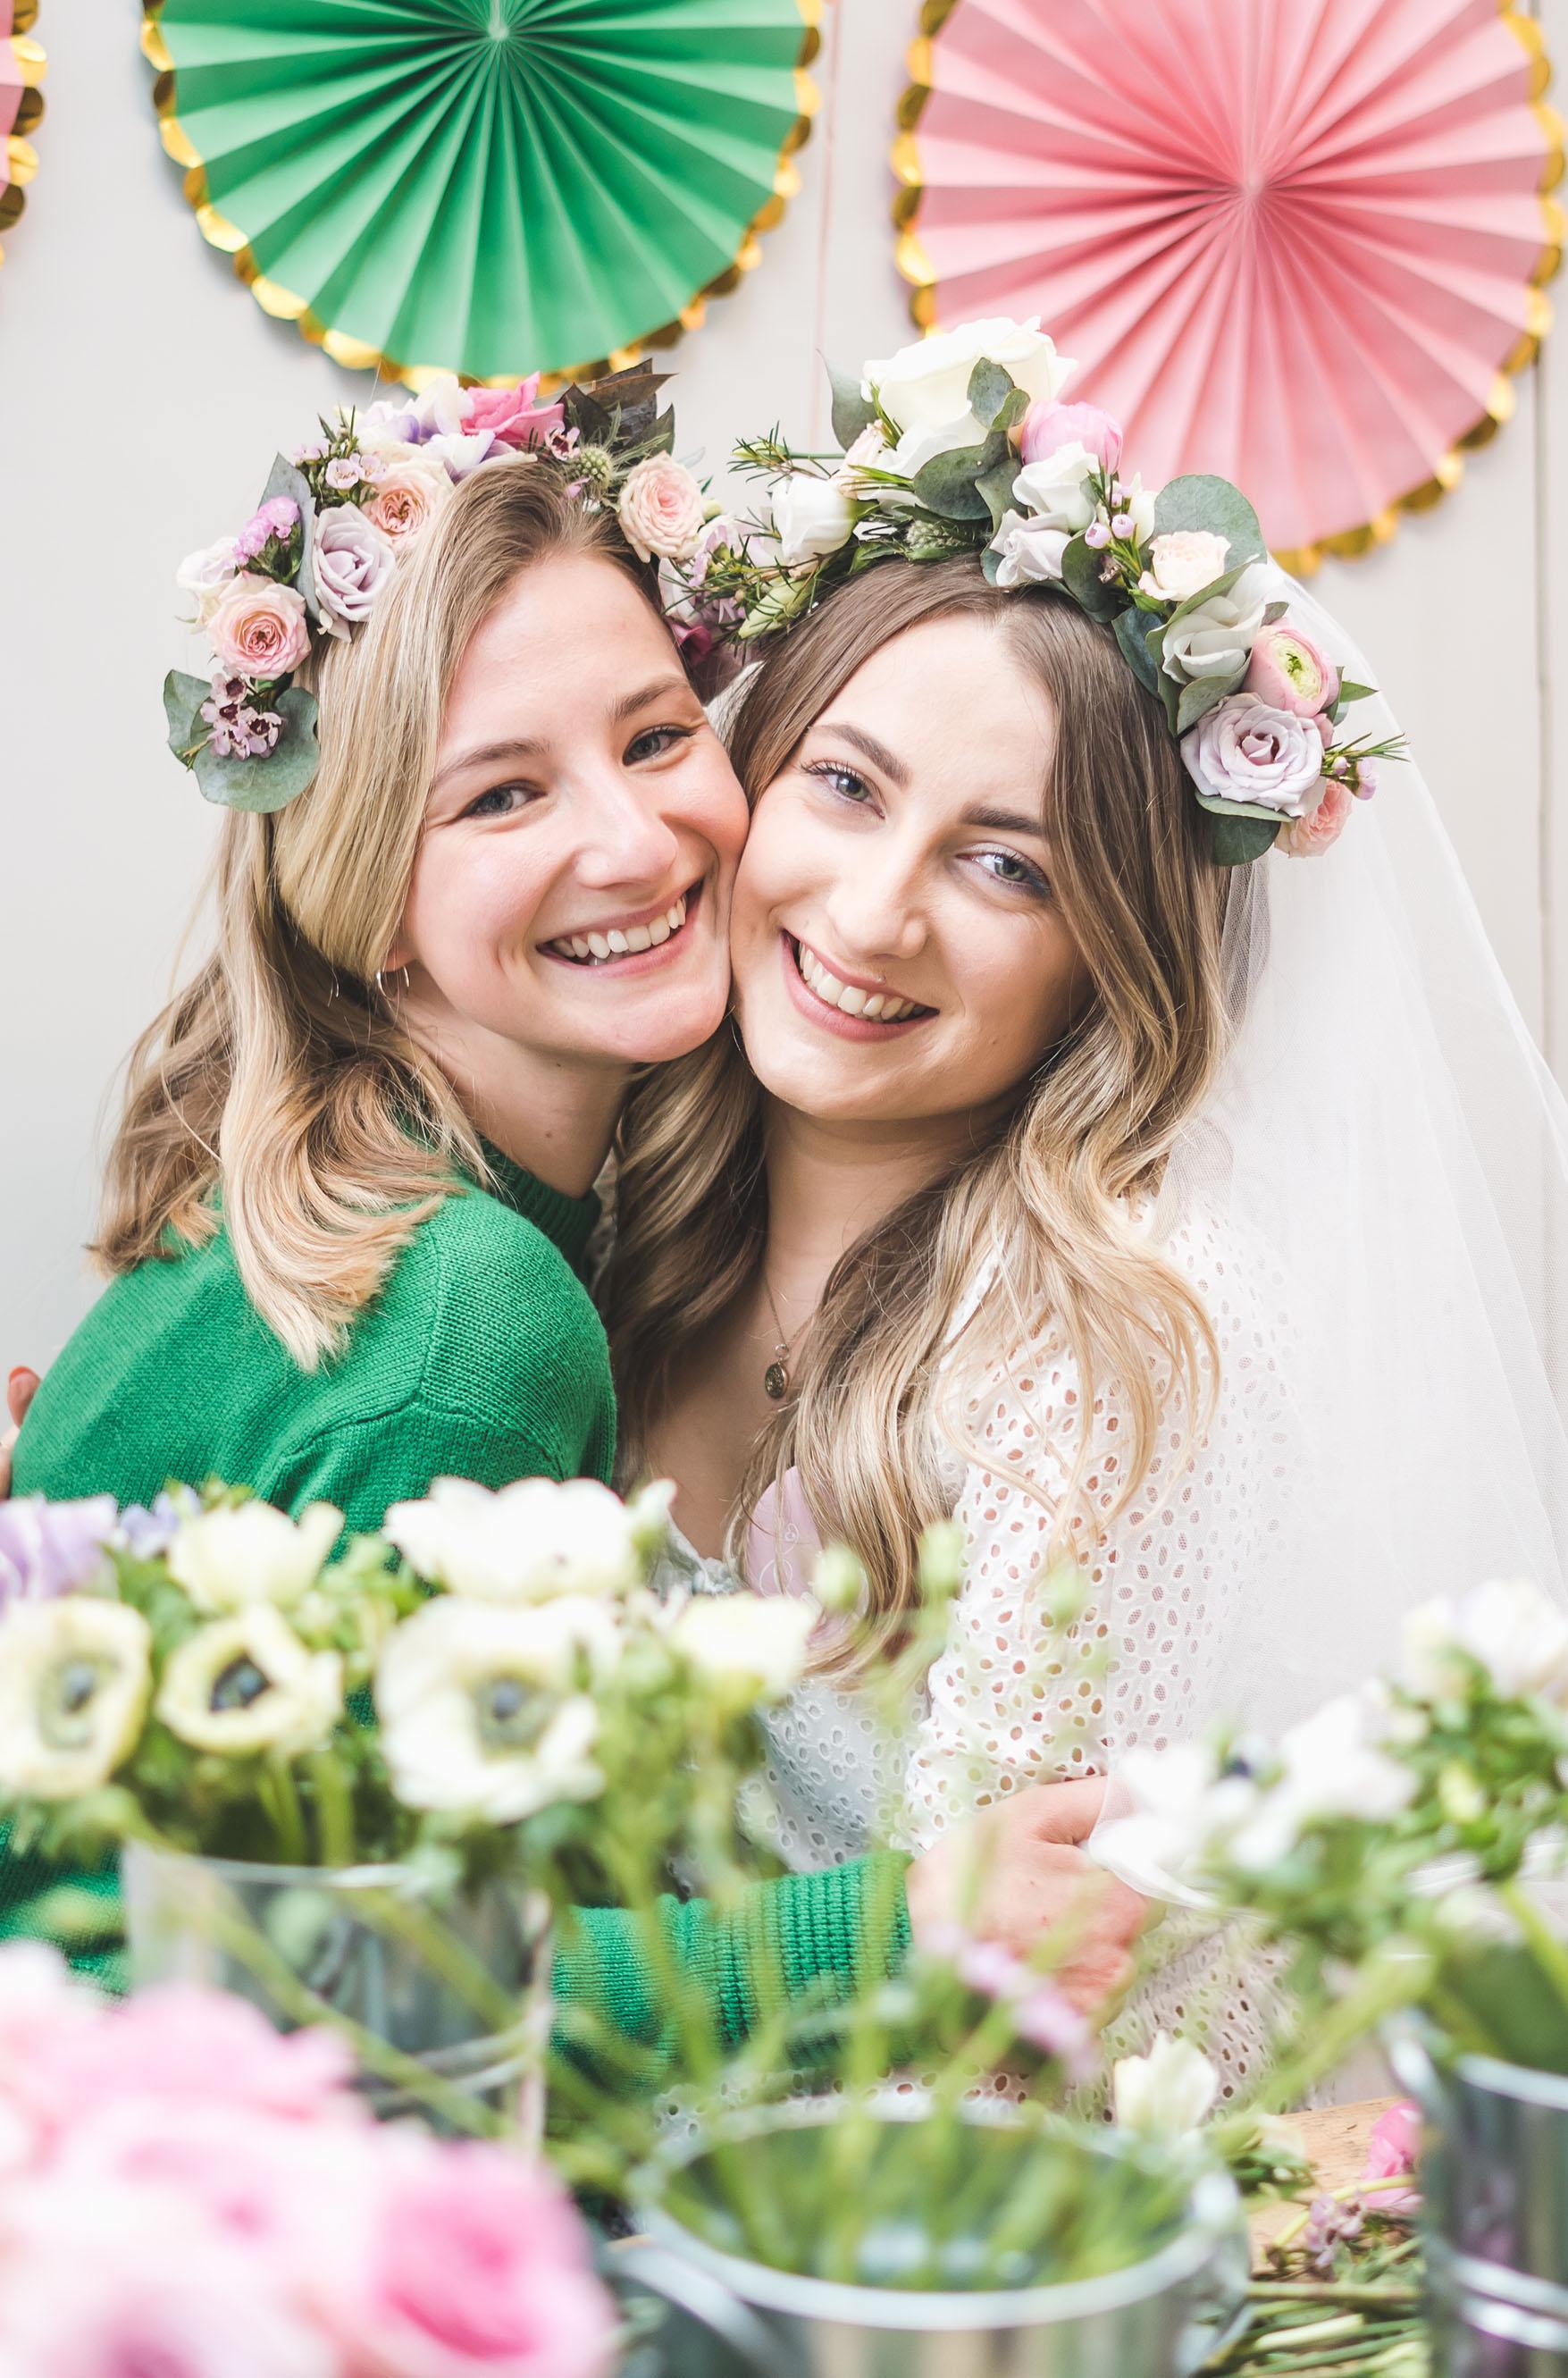 Flourish and Grace flower crown workshop